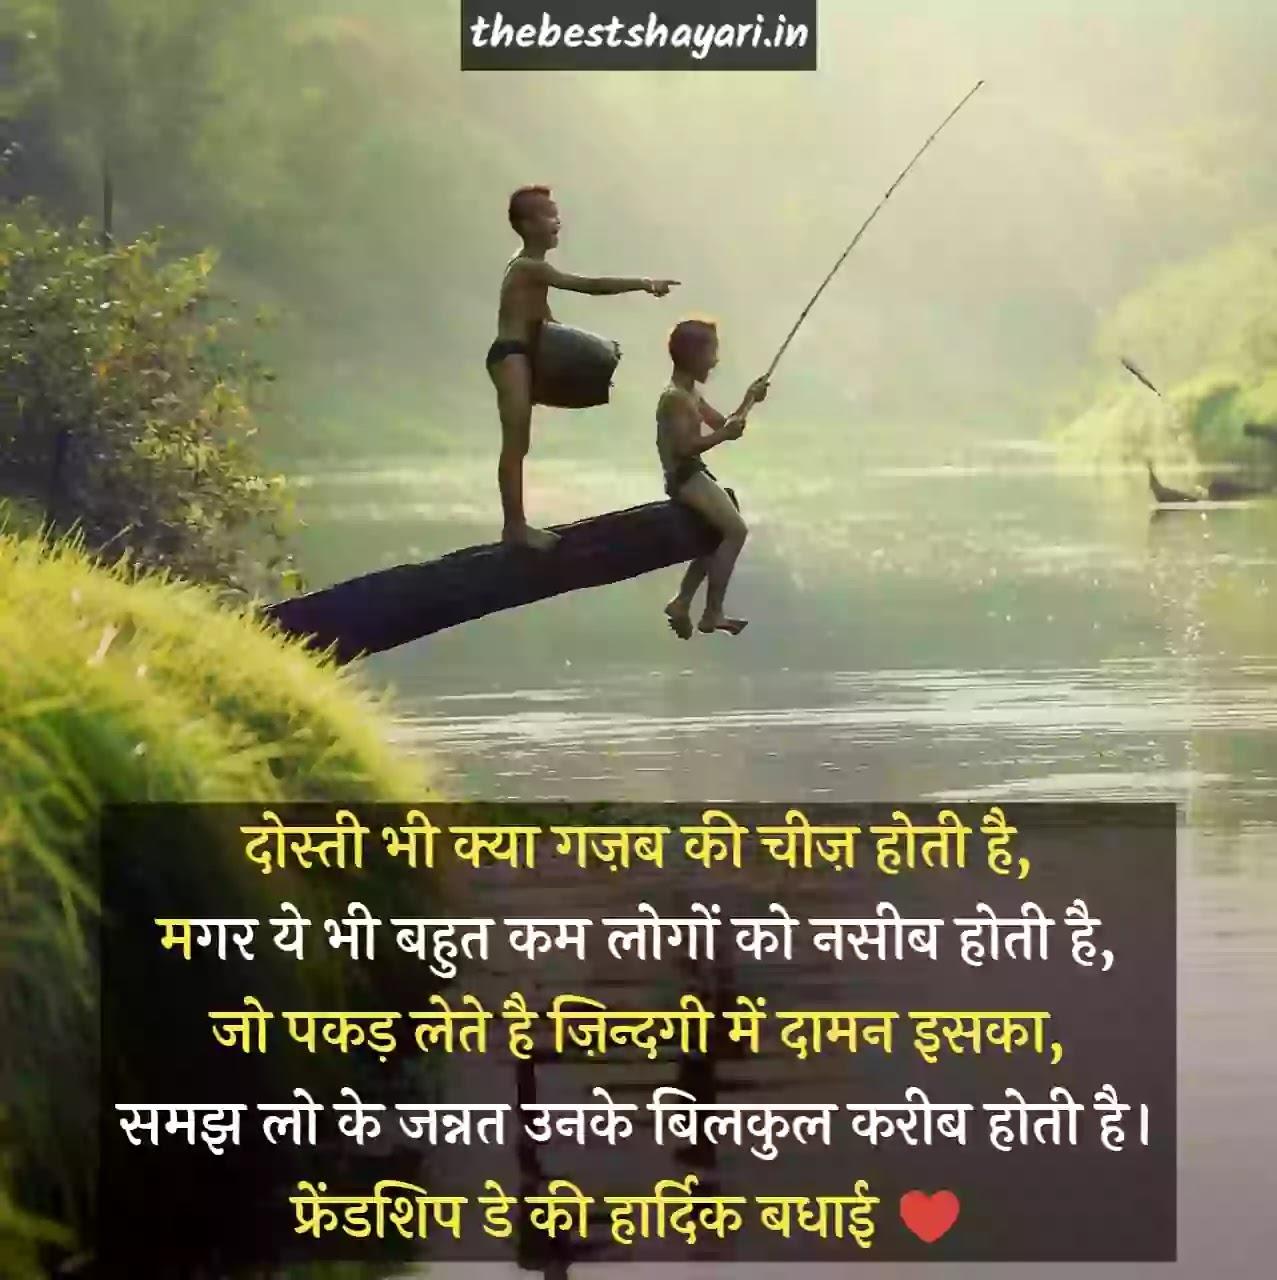 Shayari Hindi friendship day